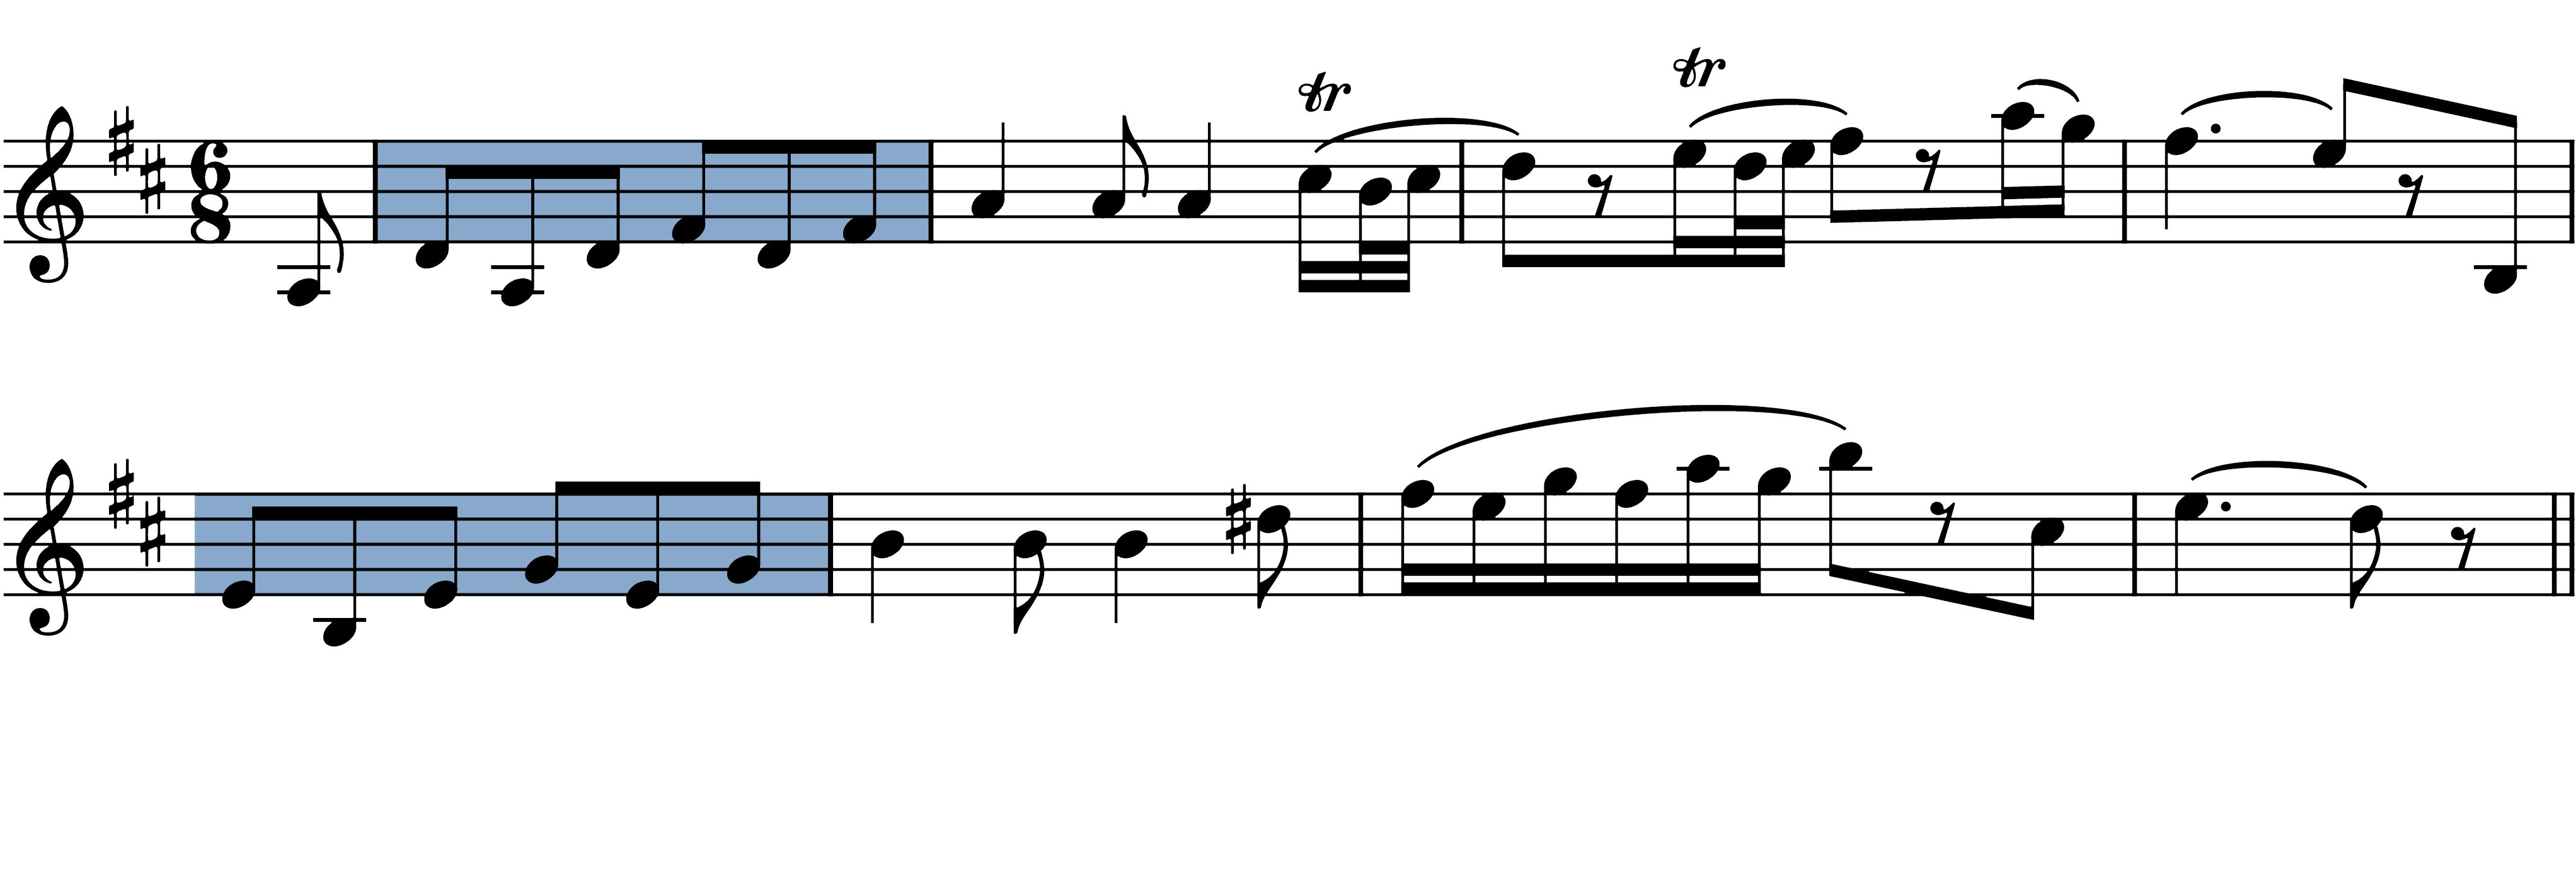 sonata-k576 melodic figures